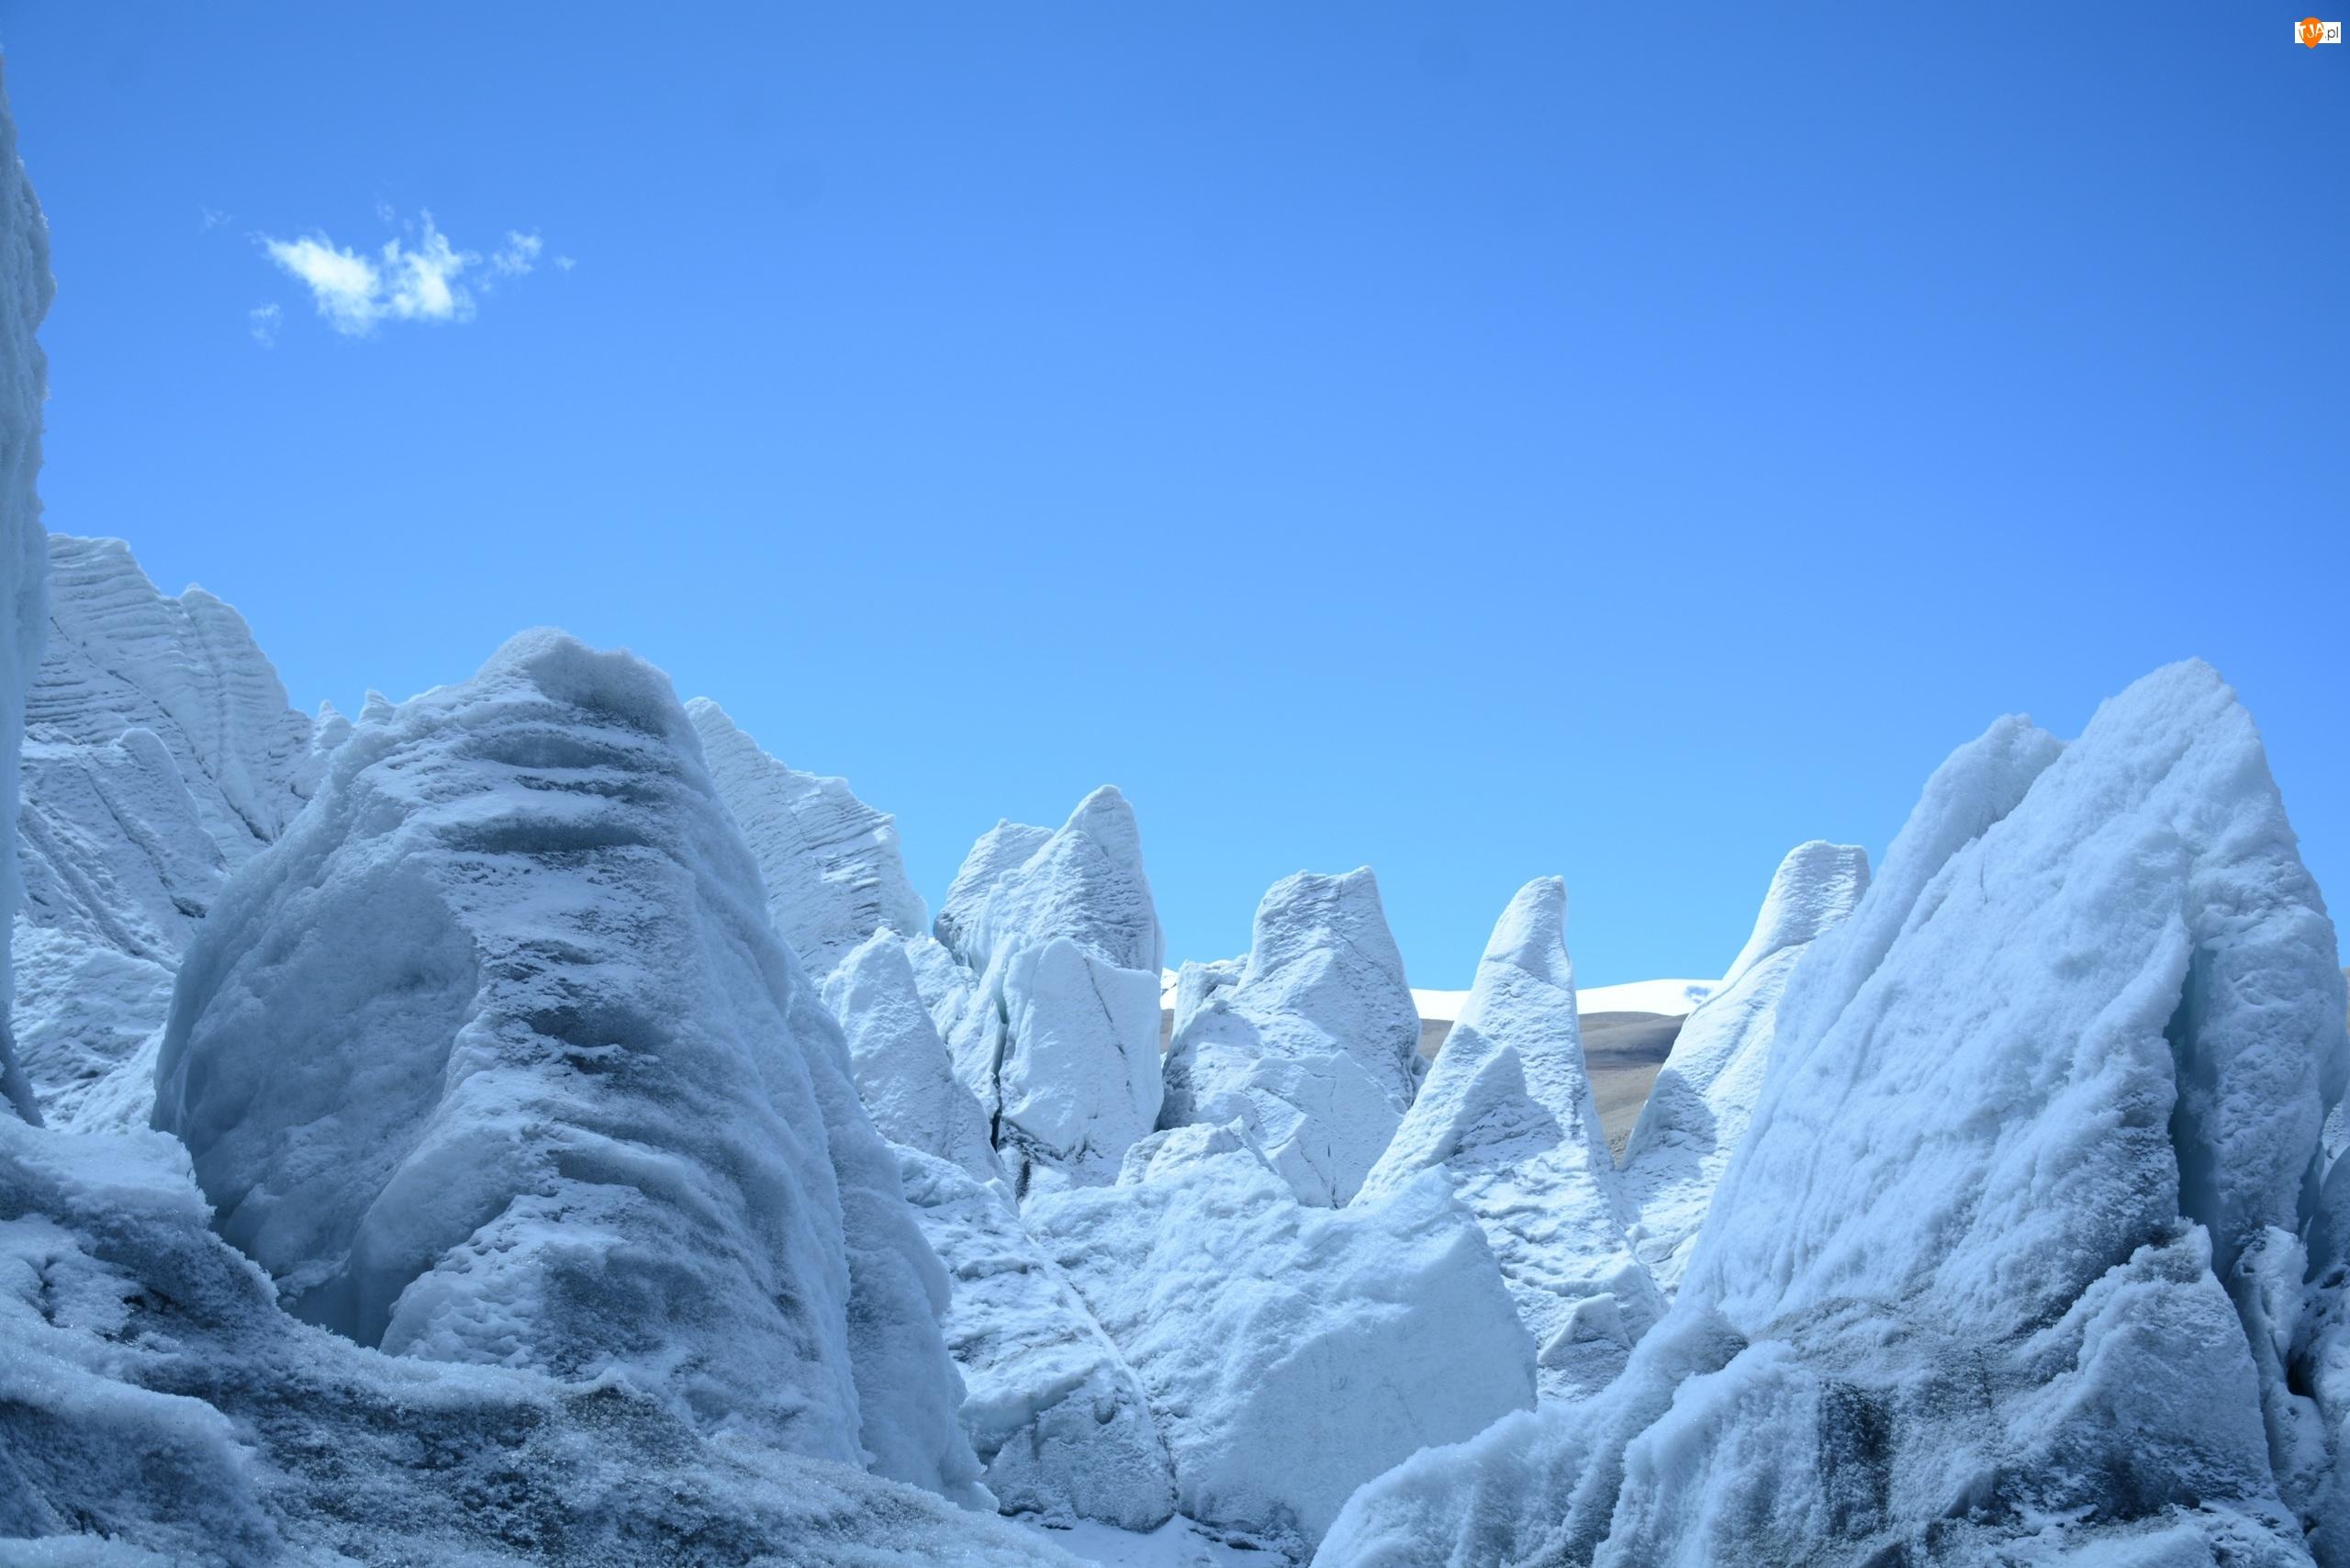 Antarktyda, Góry, Lodowe